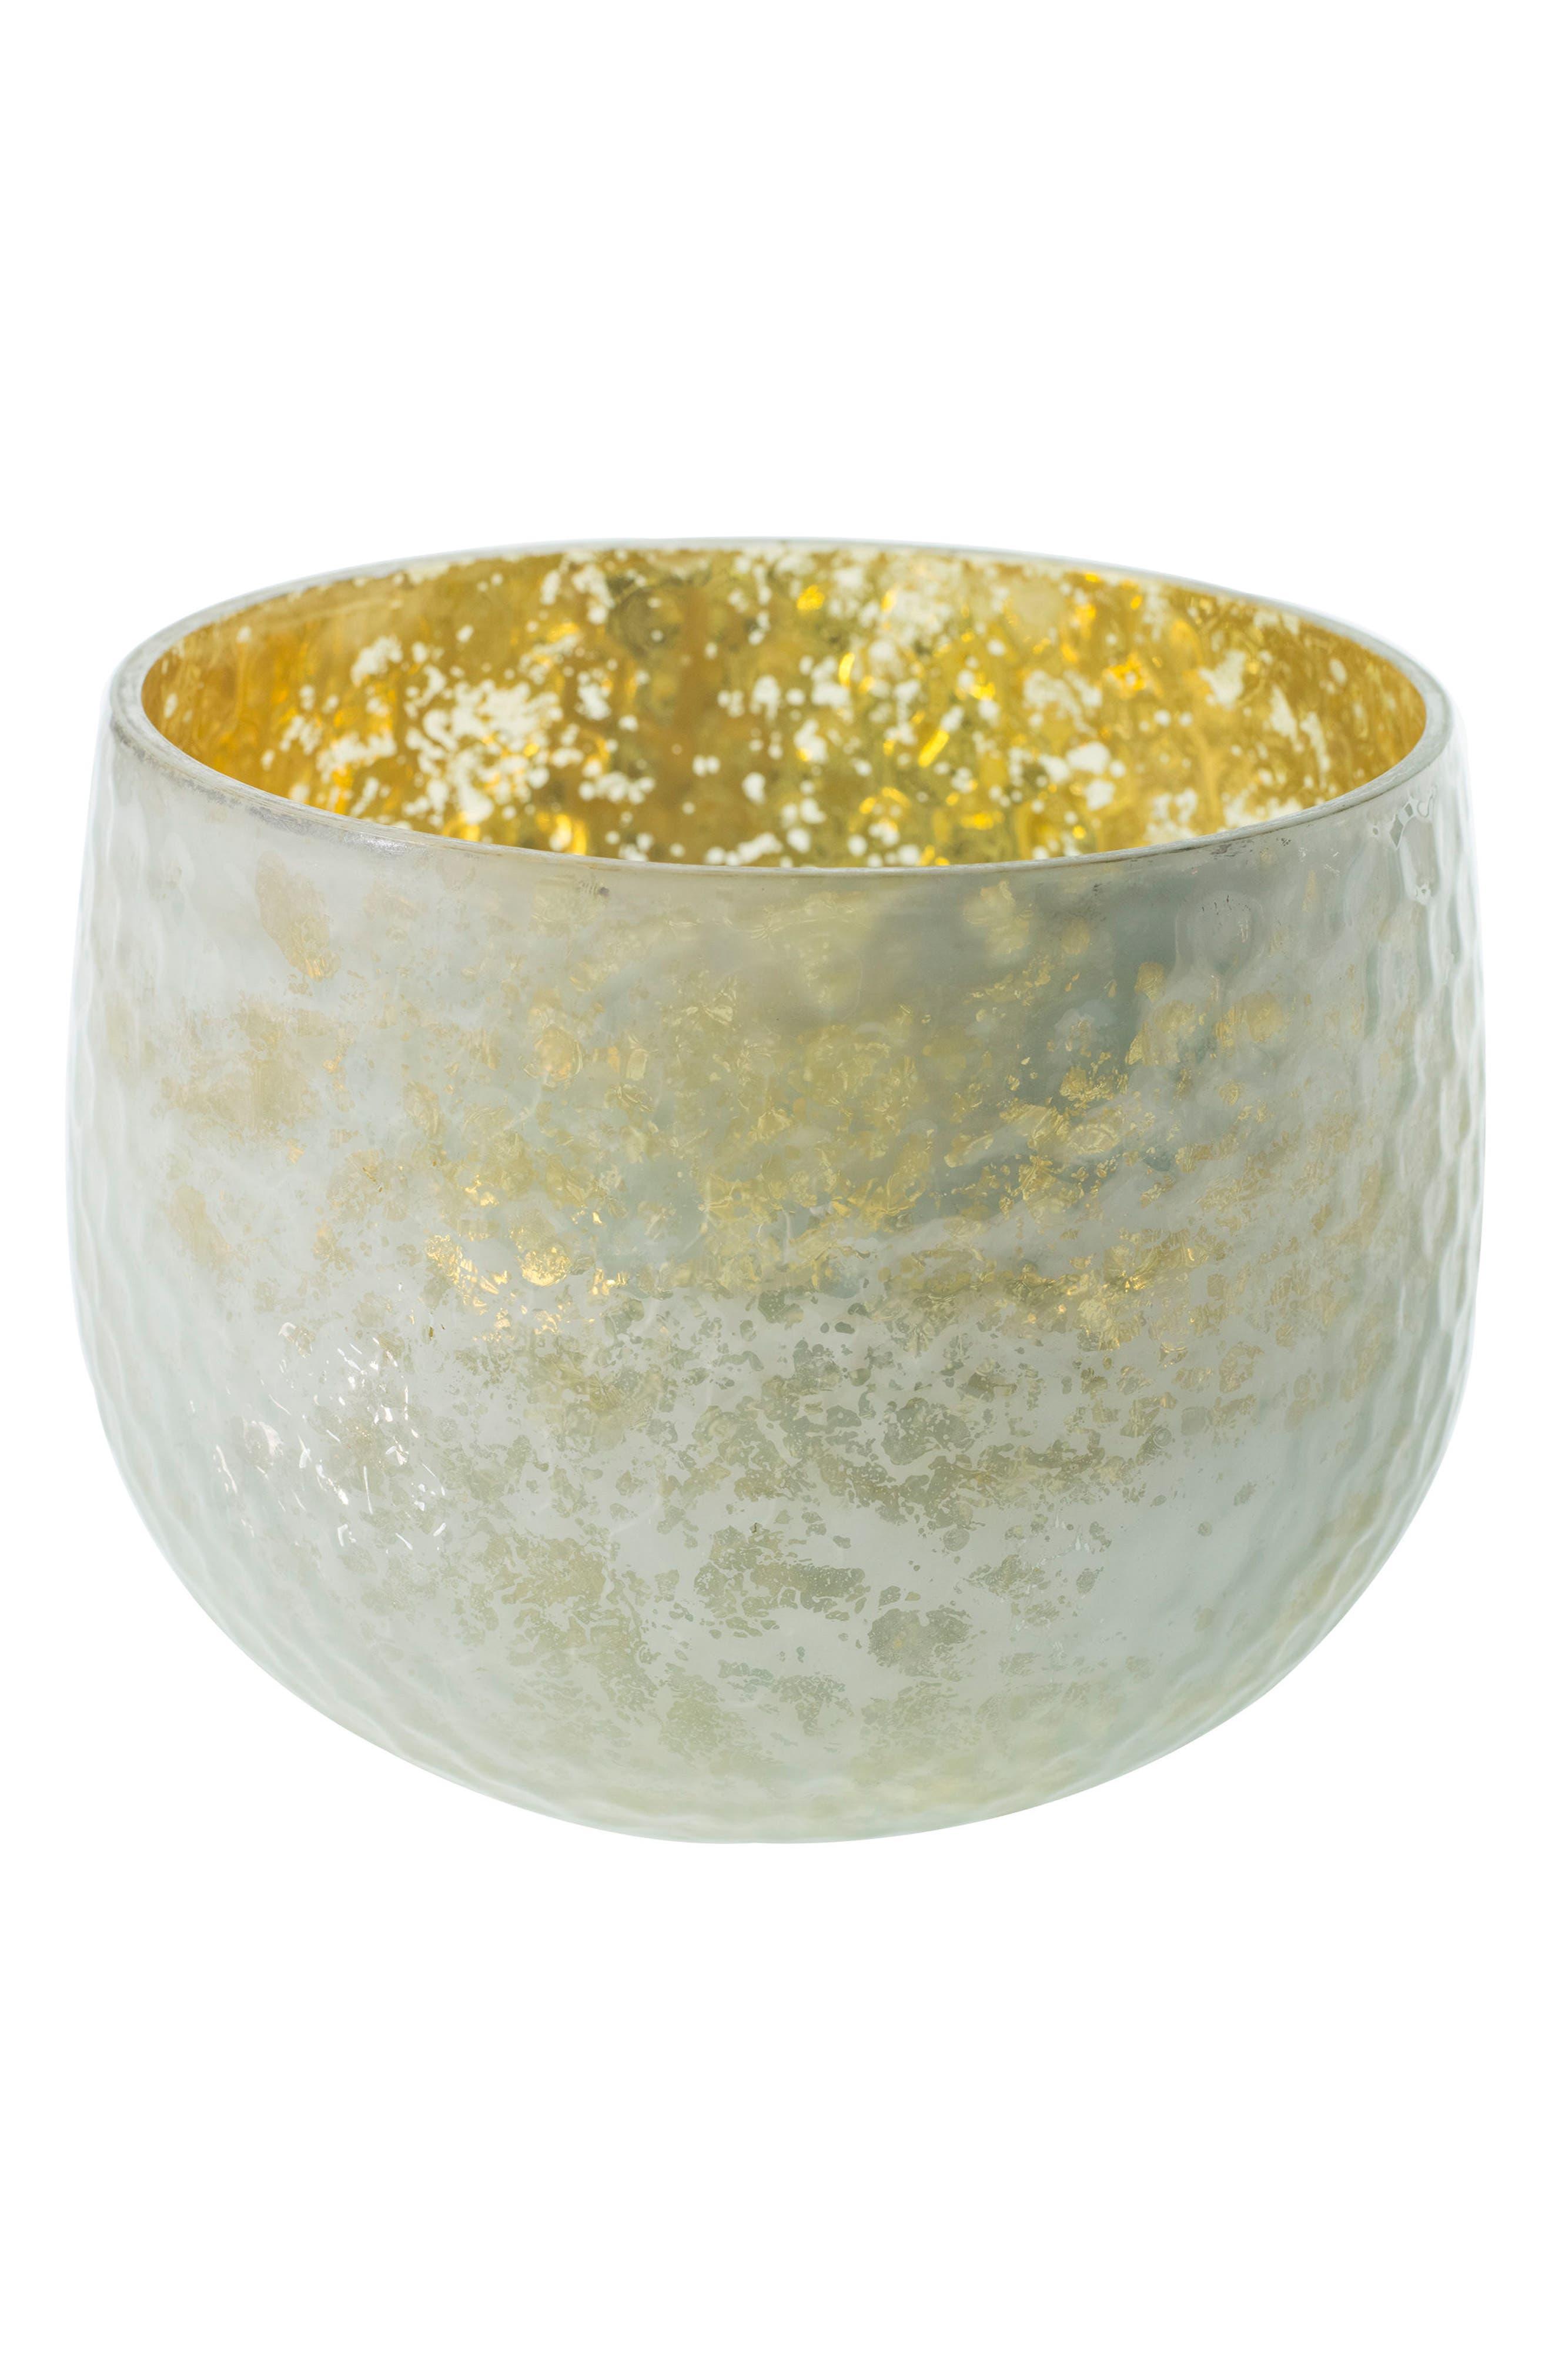 Radiant Mercury Glass Vase,                             Main thumbnail 1, color,                             White